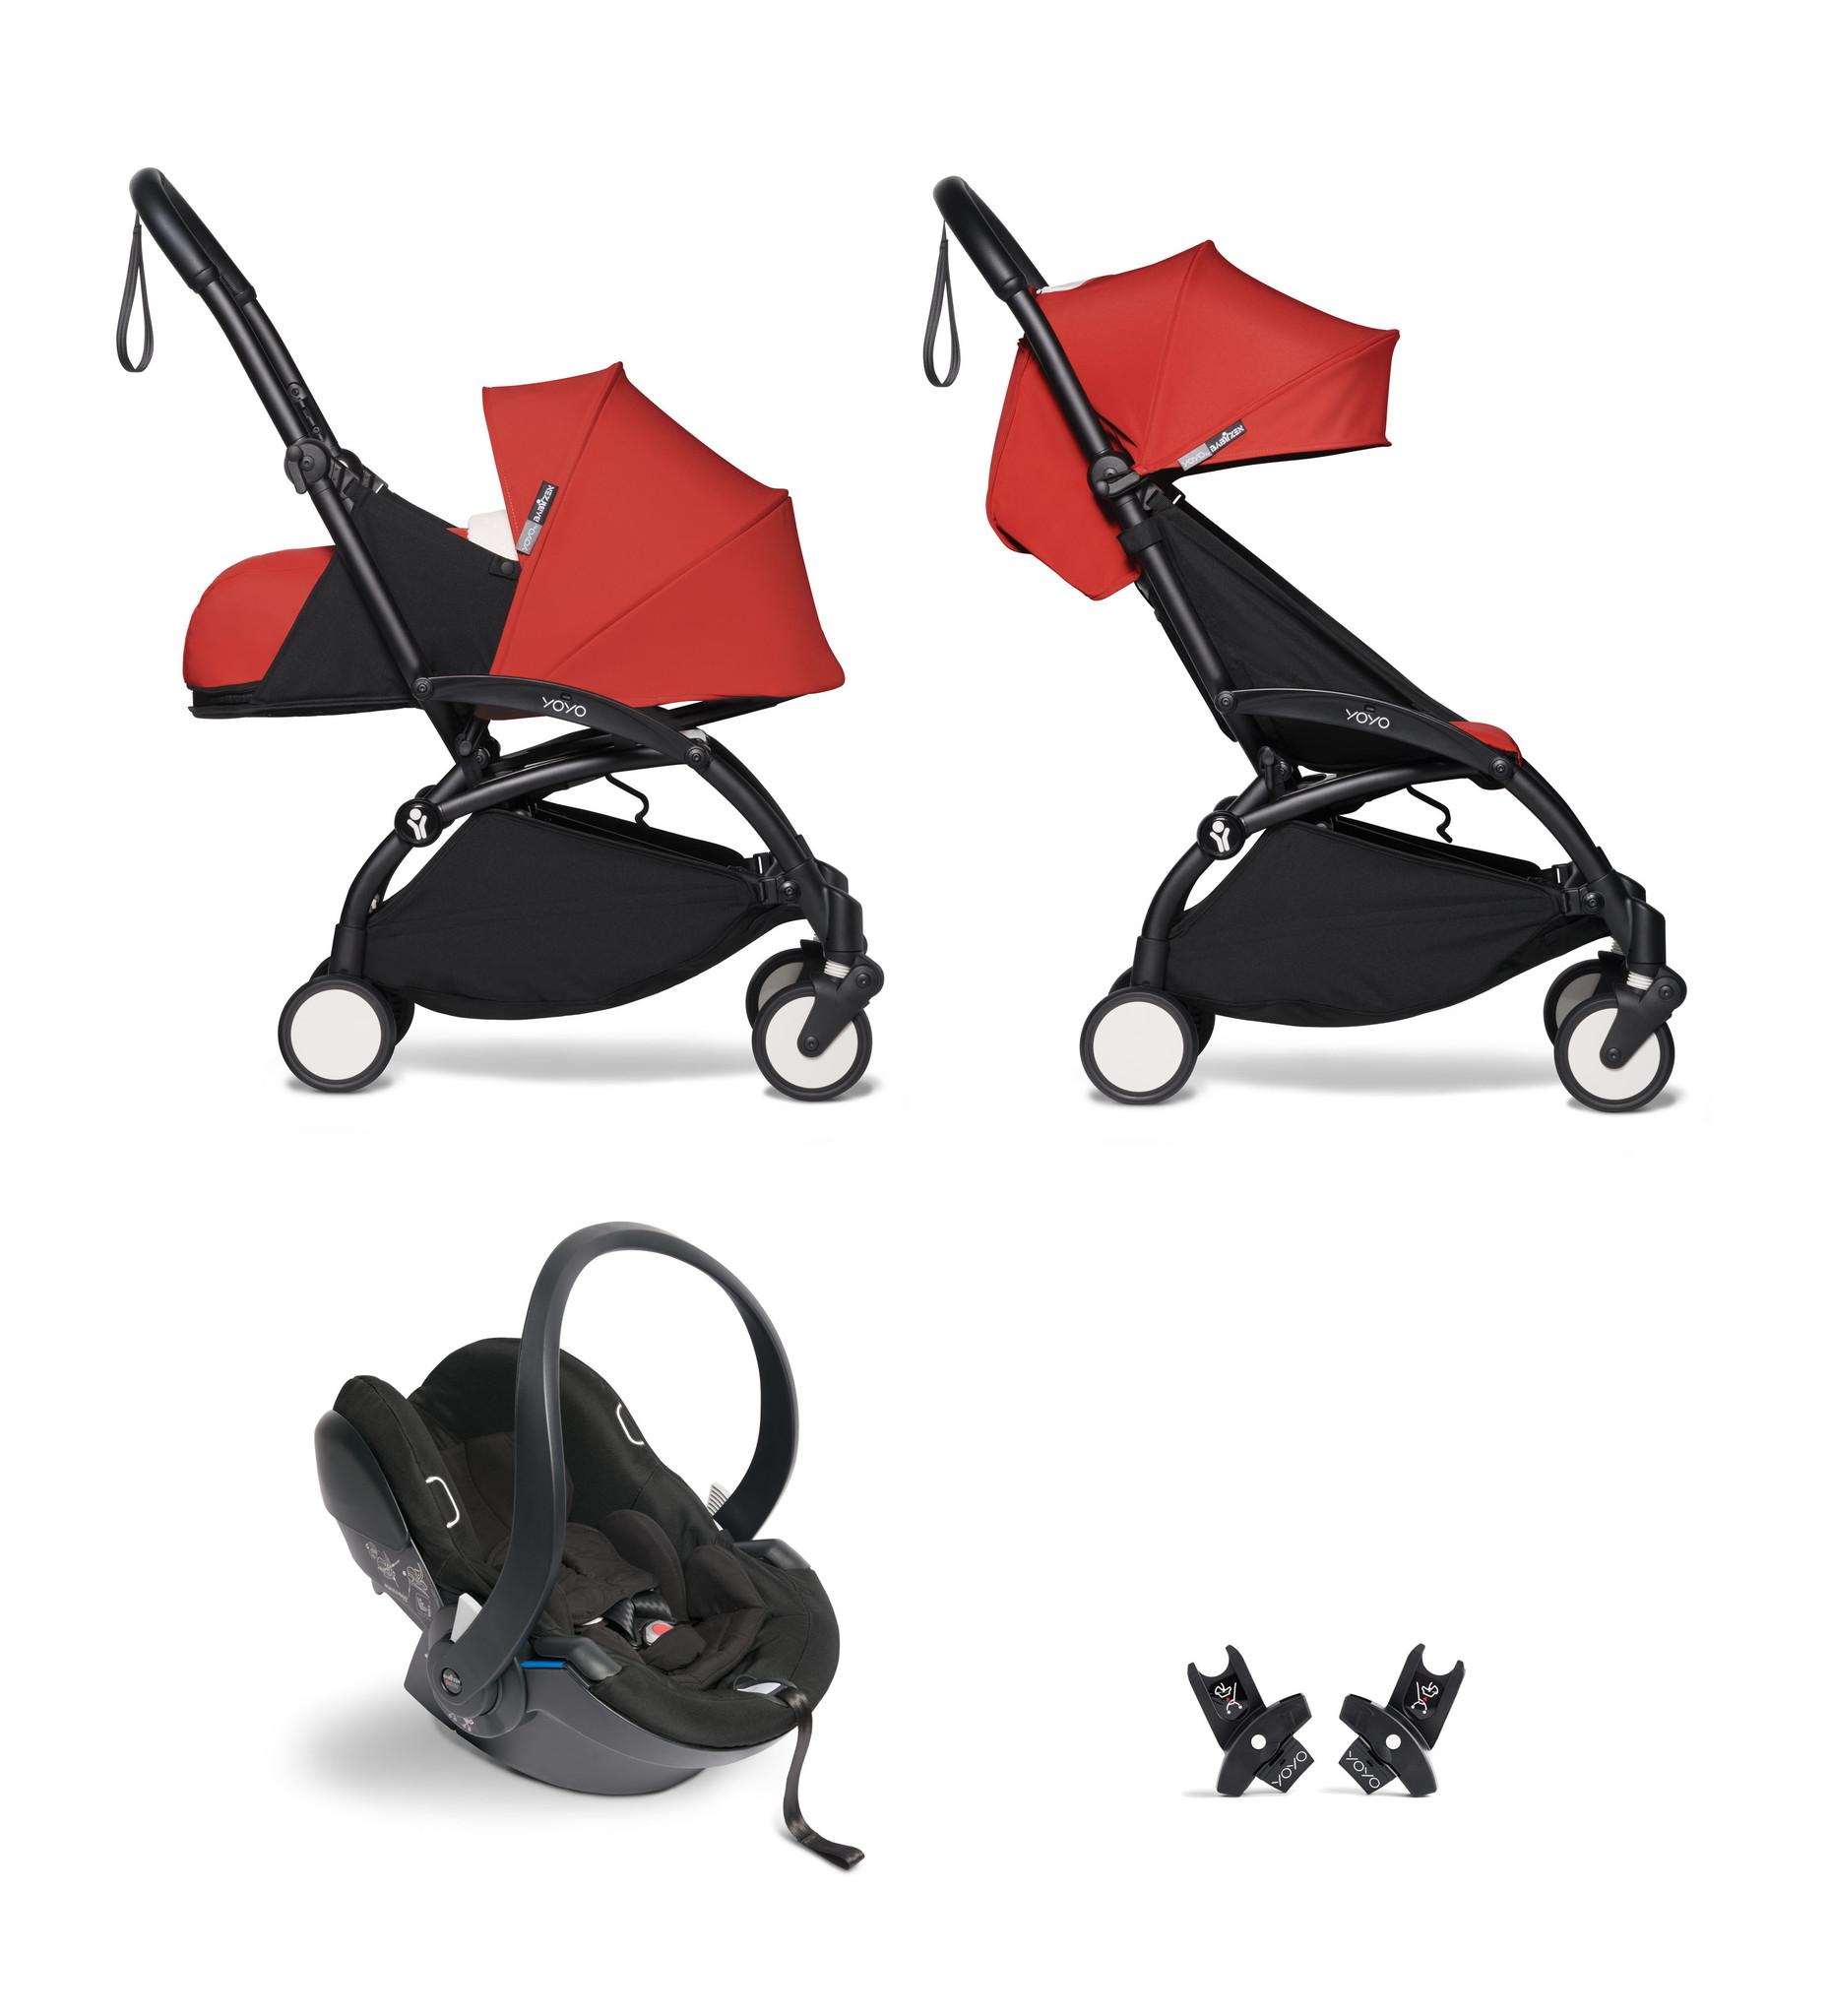 Babyzen Babyzen YOYO² buggy COMPLEET / FULL SET 0+ and 6+ rood frame zwart incl. YOYO² BeSafe autostoel zwart